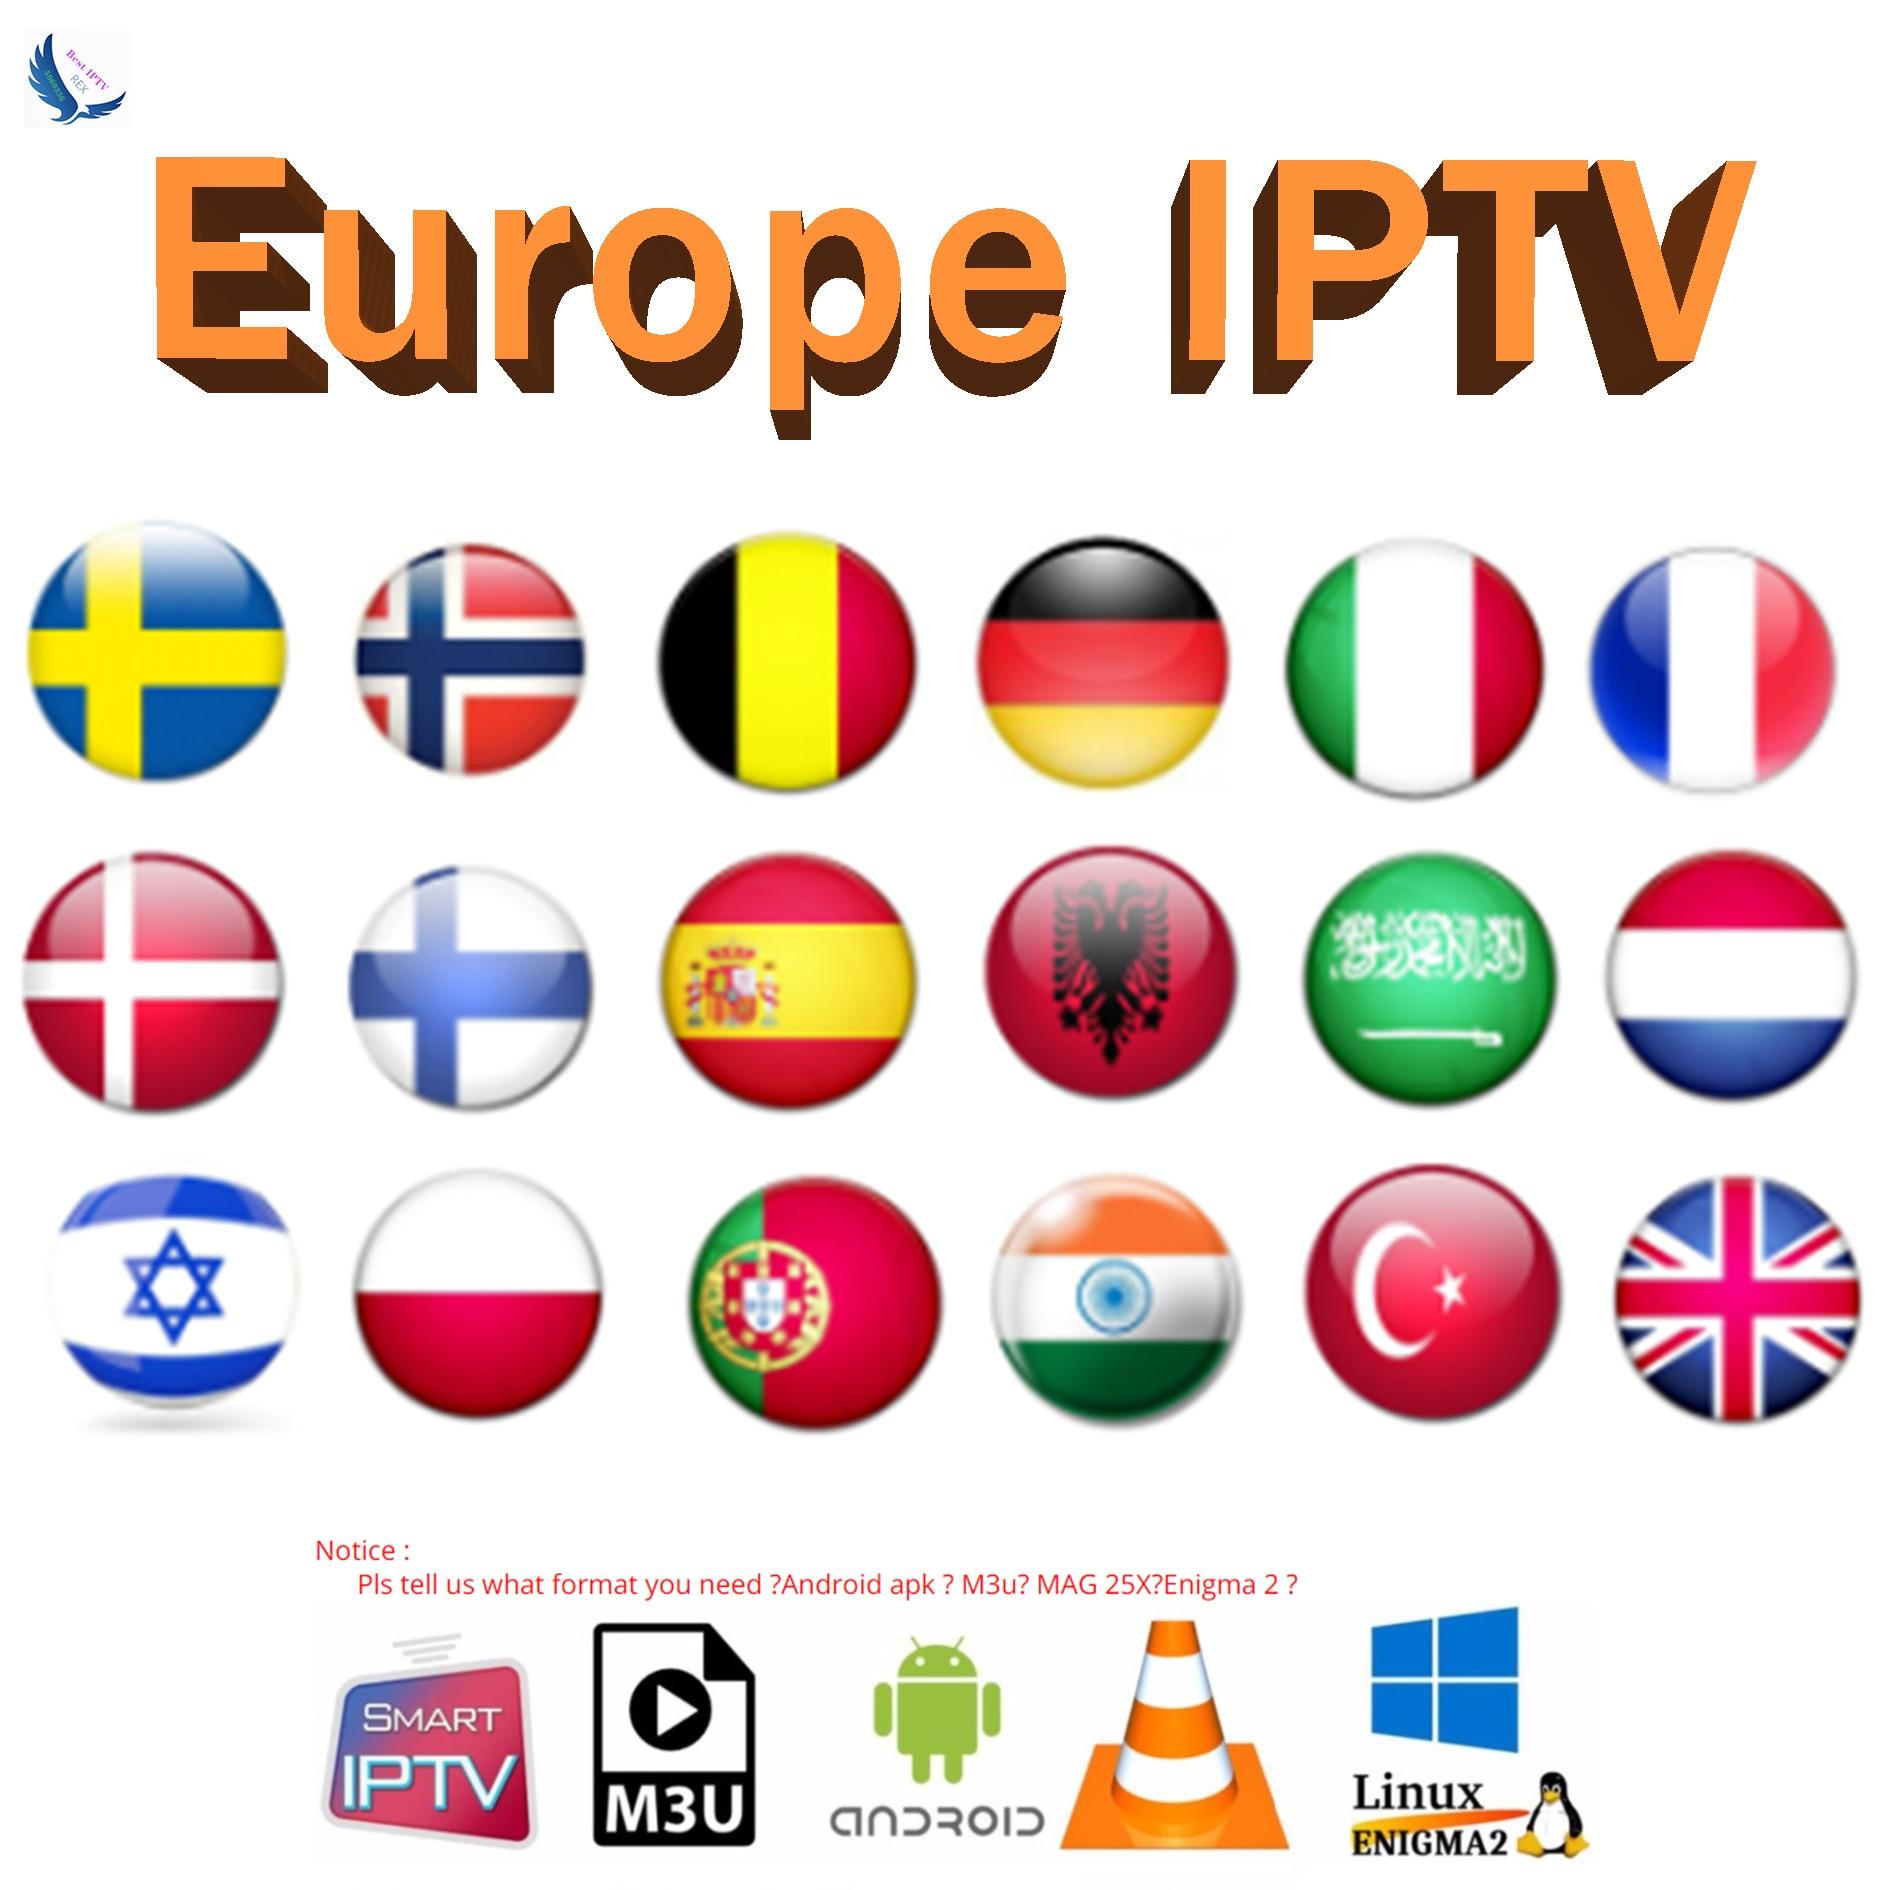 World IPTV Europe Iptv Subscription Europe Iptv Portugal Spain France Italy USA Dutch Iptv M3u For Smart TV Android Box X96 Mini